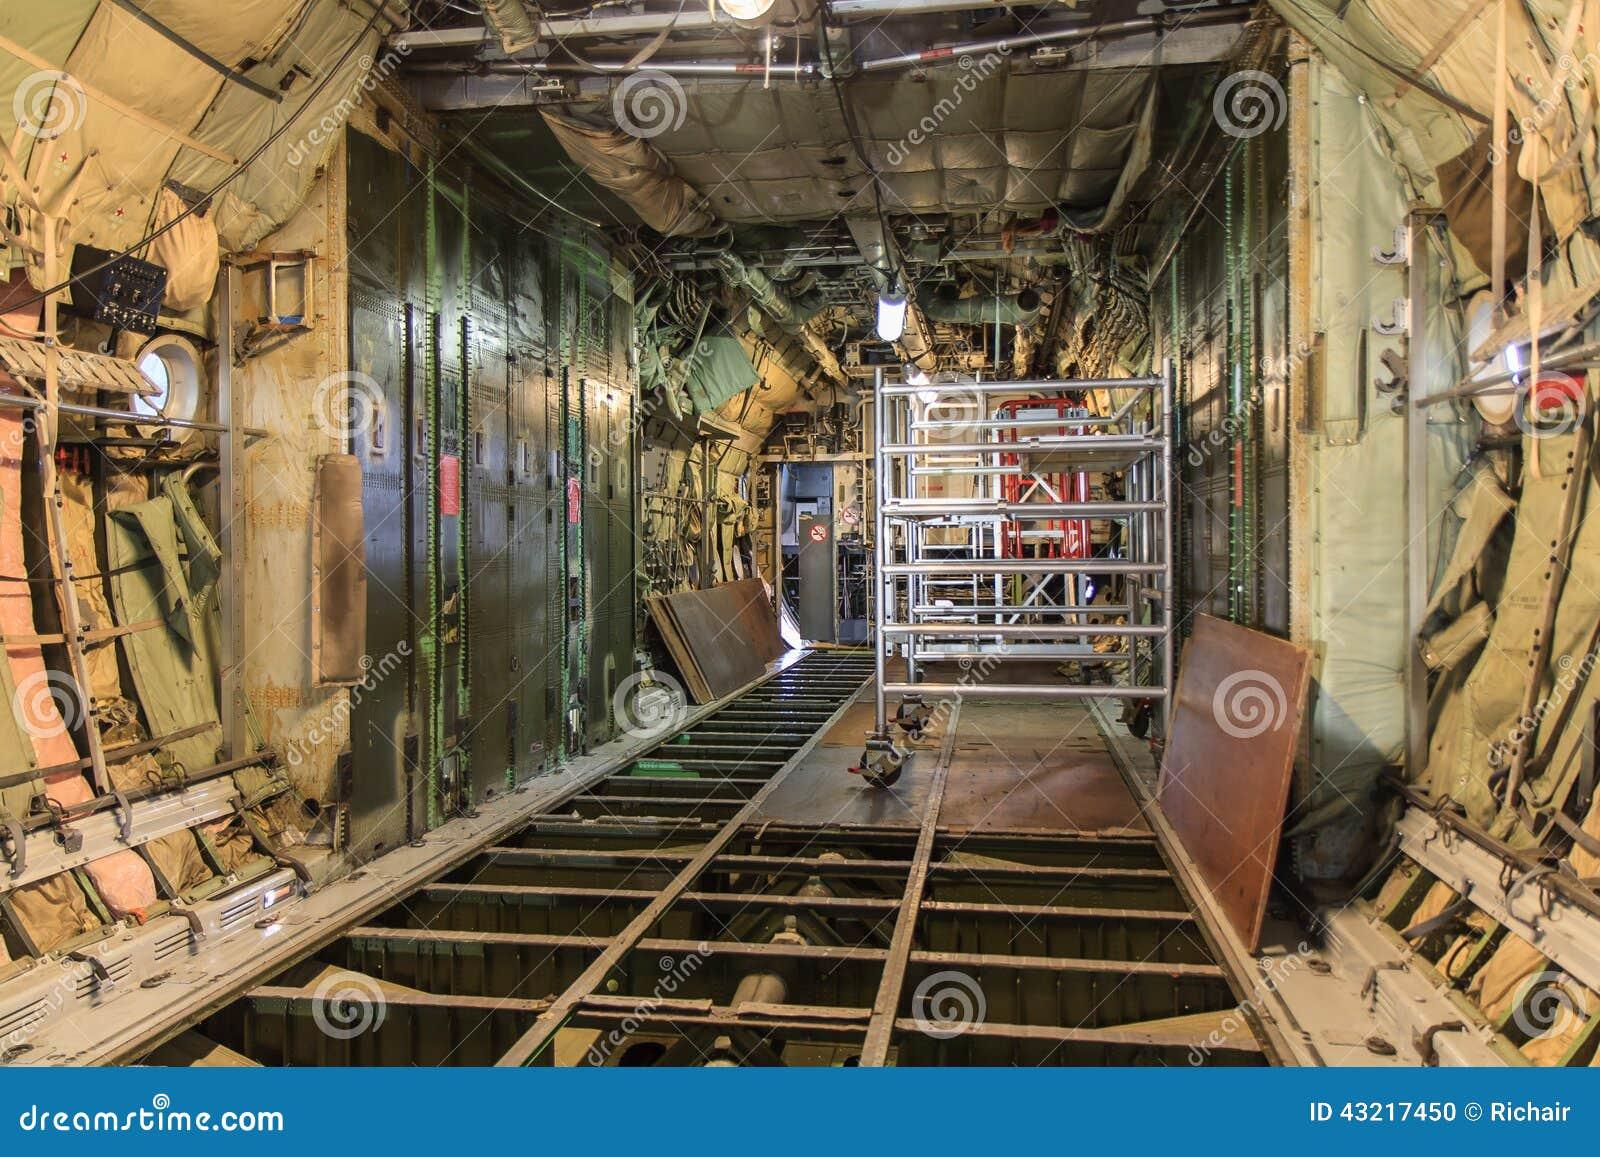 Aircraft Maintenance Stock Photo - Image: 43217450